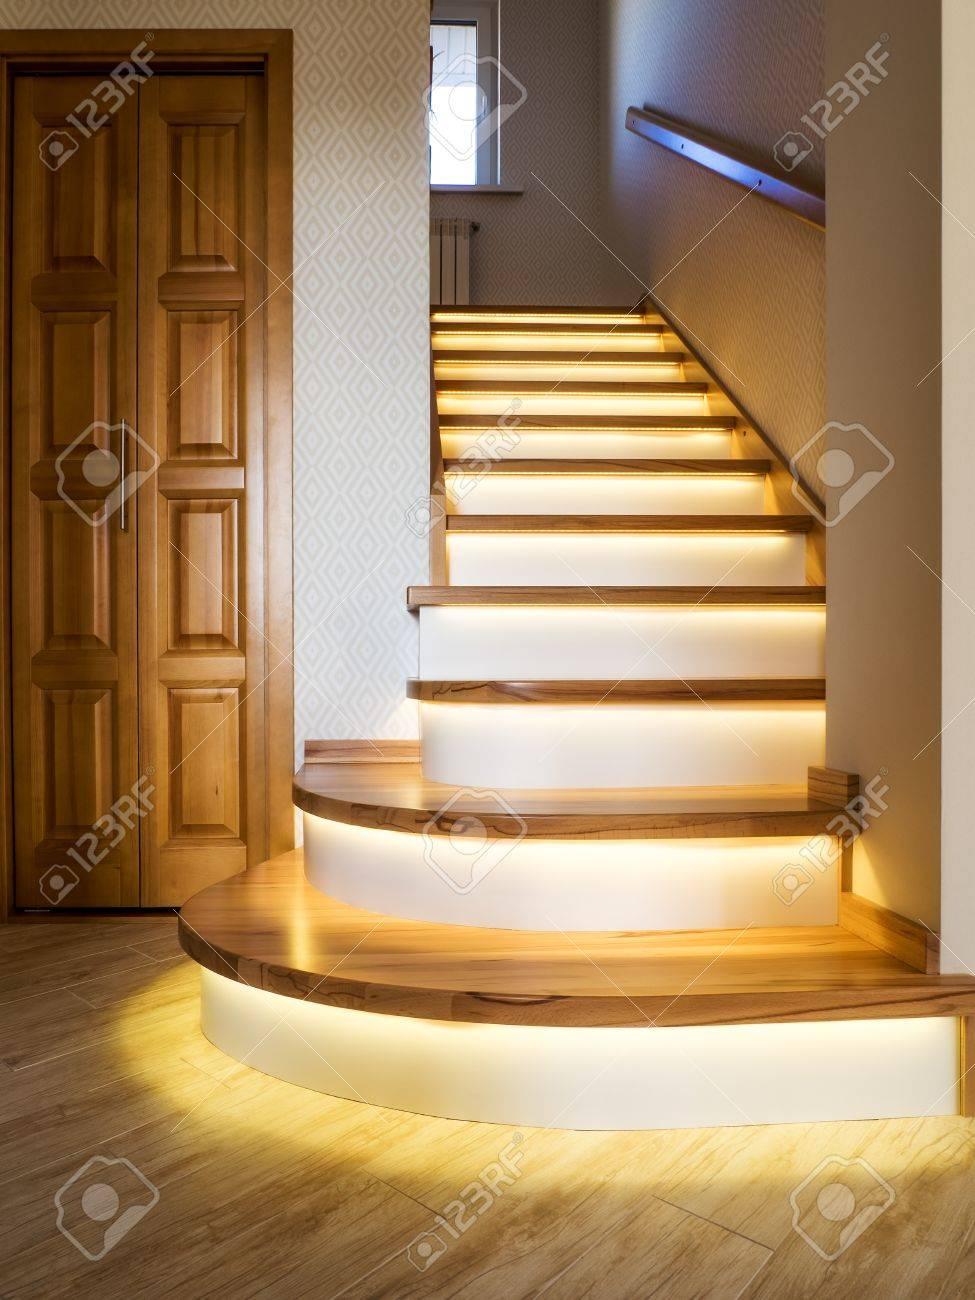 Interior Del Hogar Escalera De Caracol Con Peldaos De Madera E